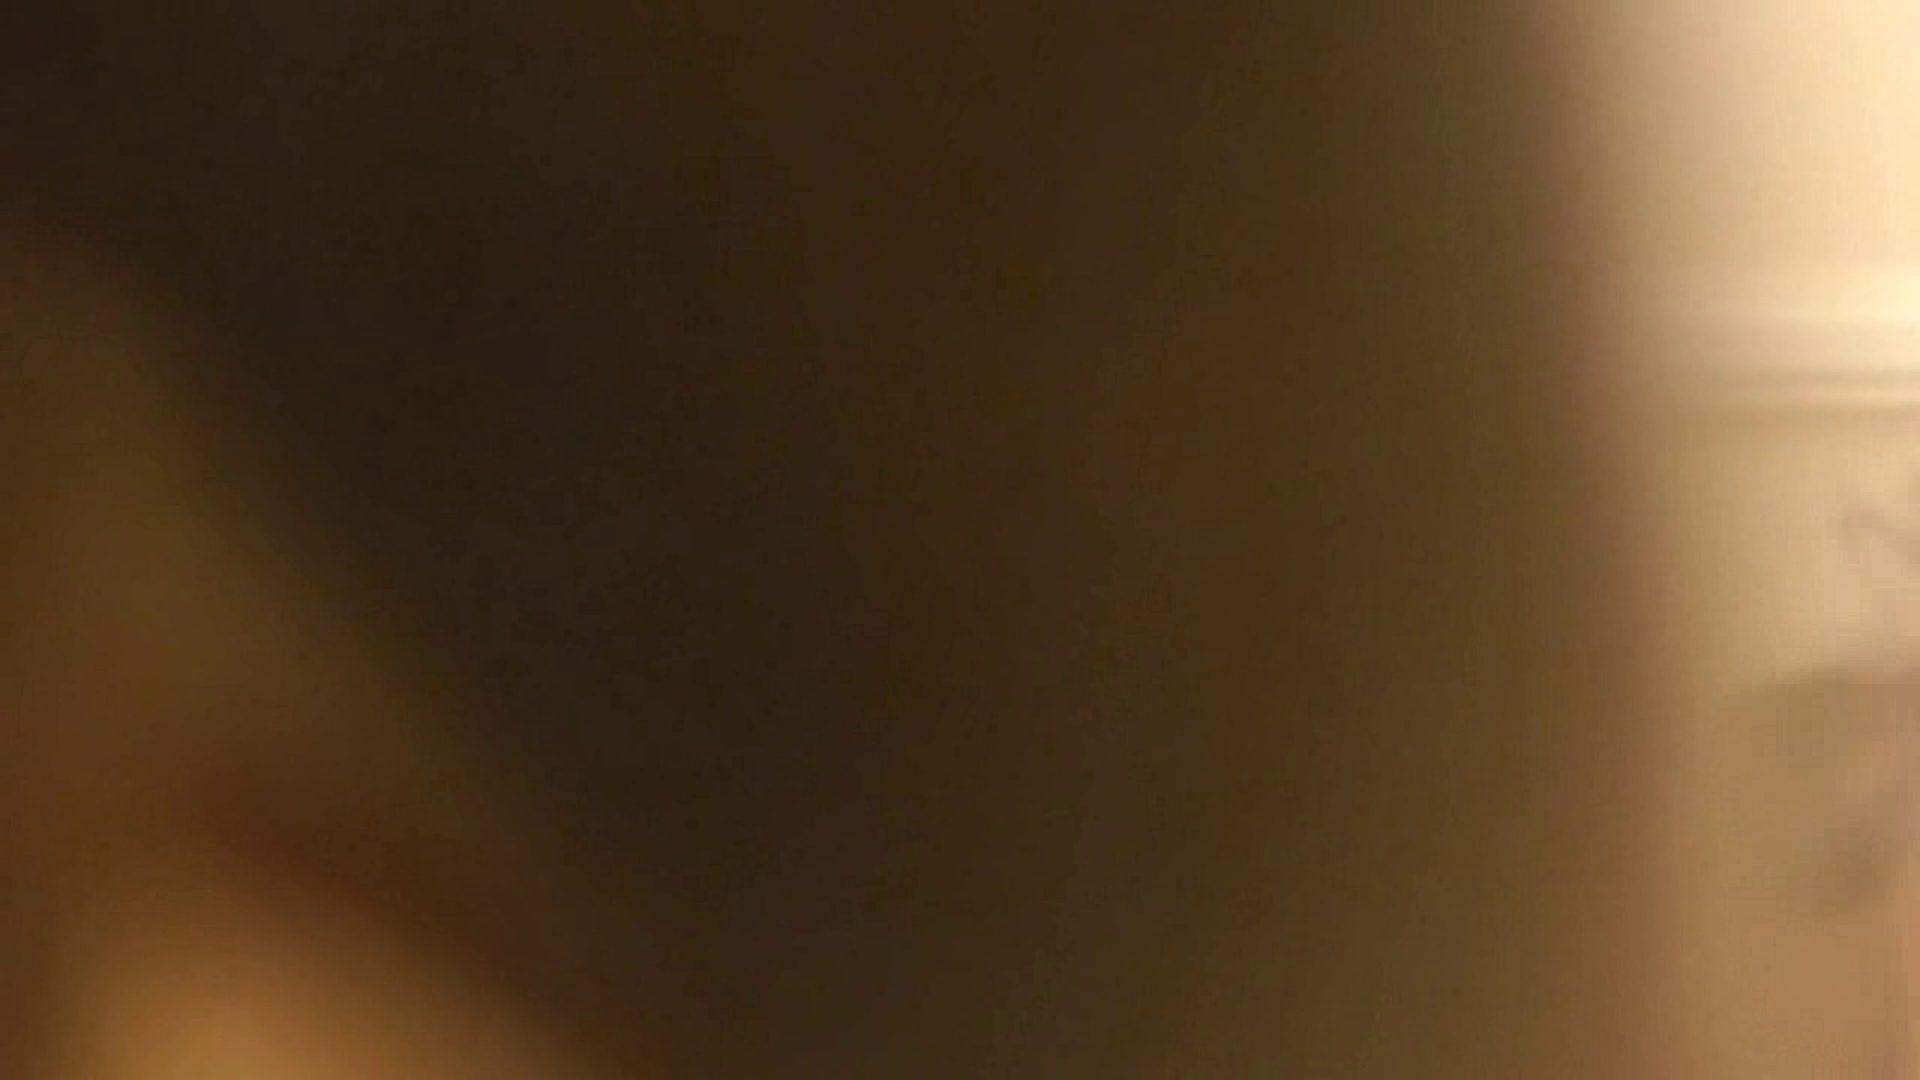 vol.1 Mayumi 窓越しに入浴シーン撮影に成功 入浴中の女性  57PIX 32